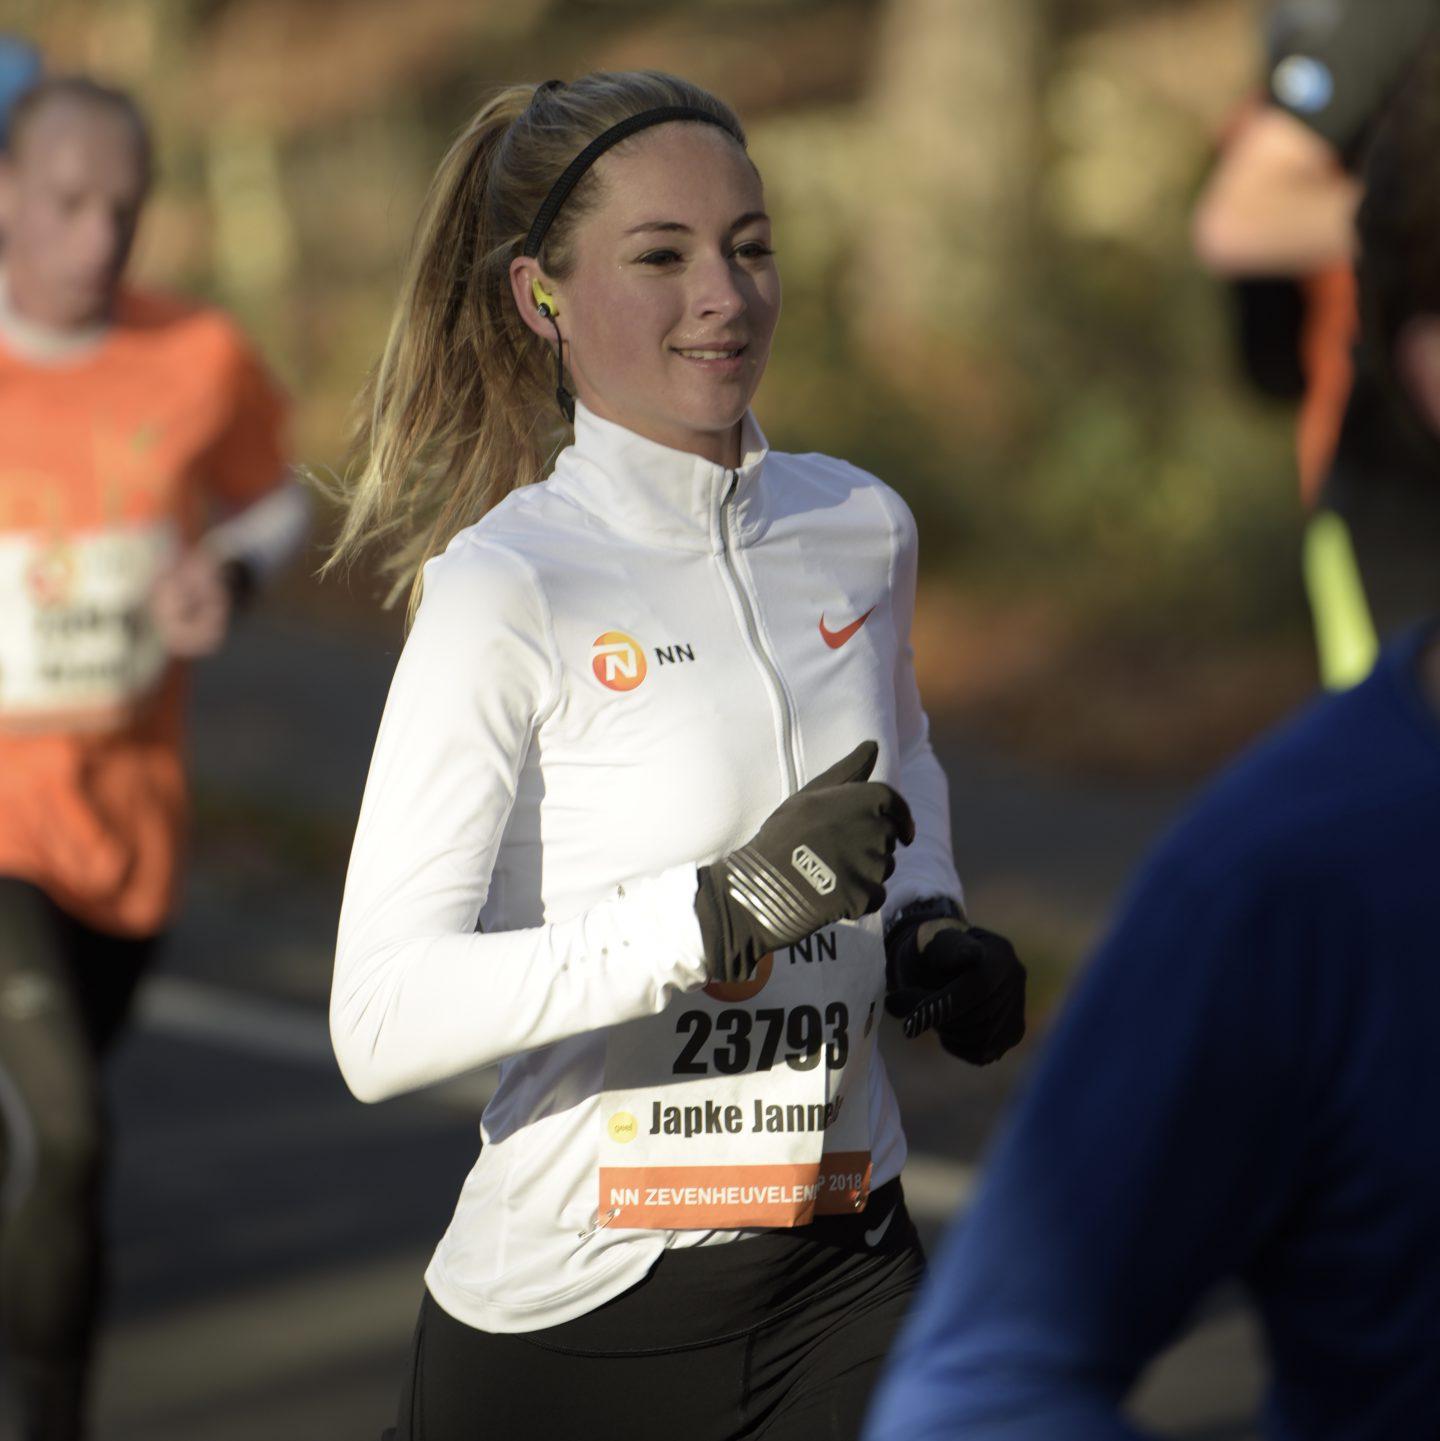 Raceverslag: NN Zevenheuvelenloop 2018